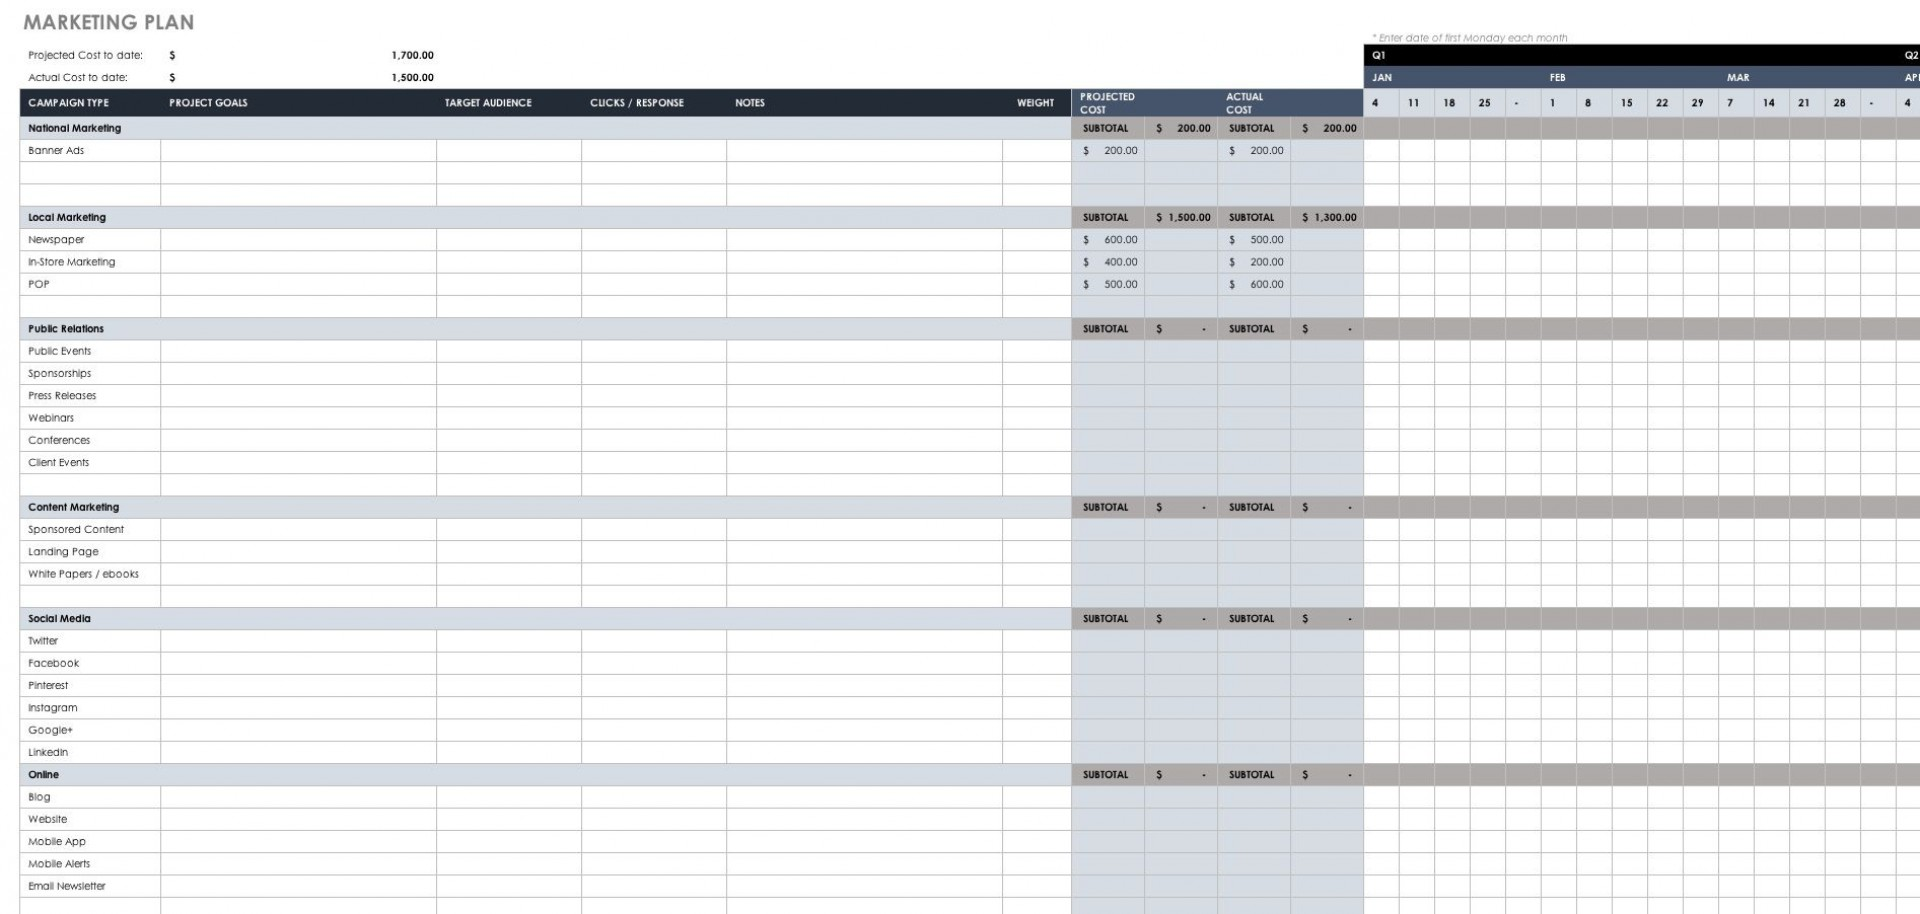 002 Surprising Free Marketing Plan Template High Definition  Music Download Digital Pdf Excel1920